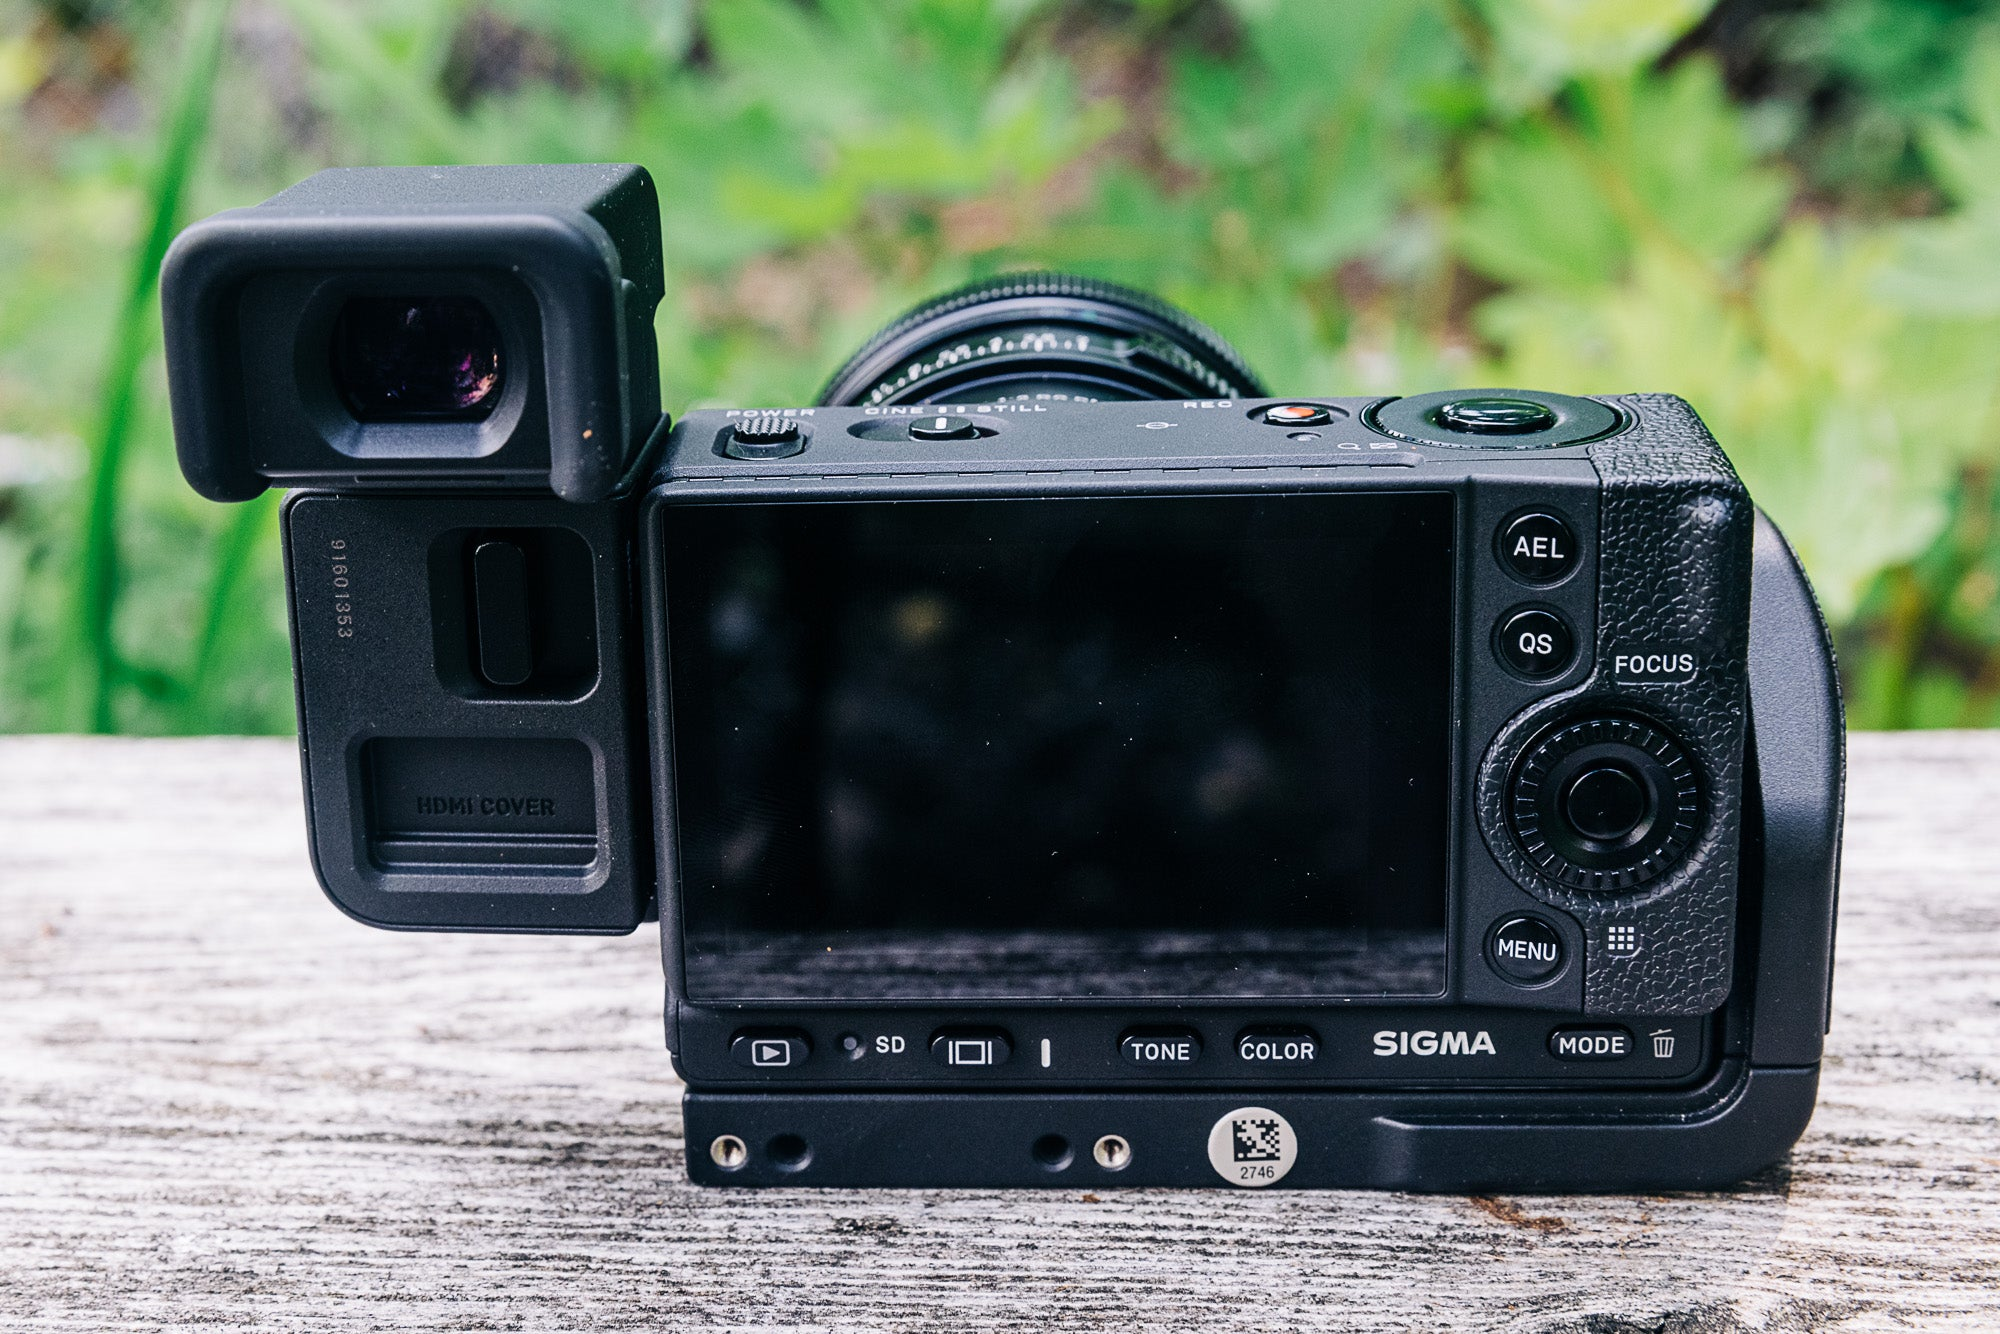 Sigma's FP L camera